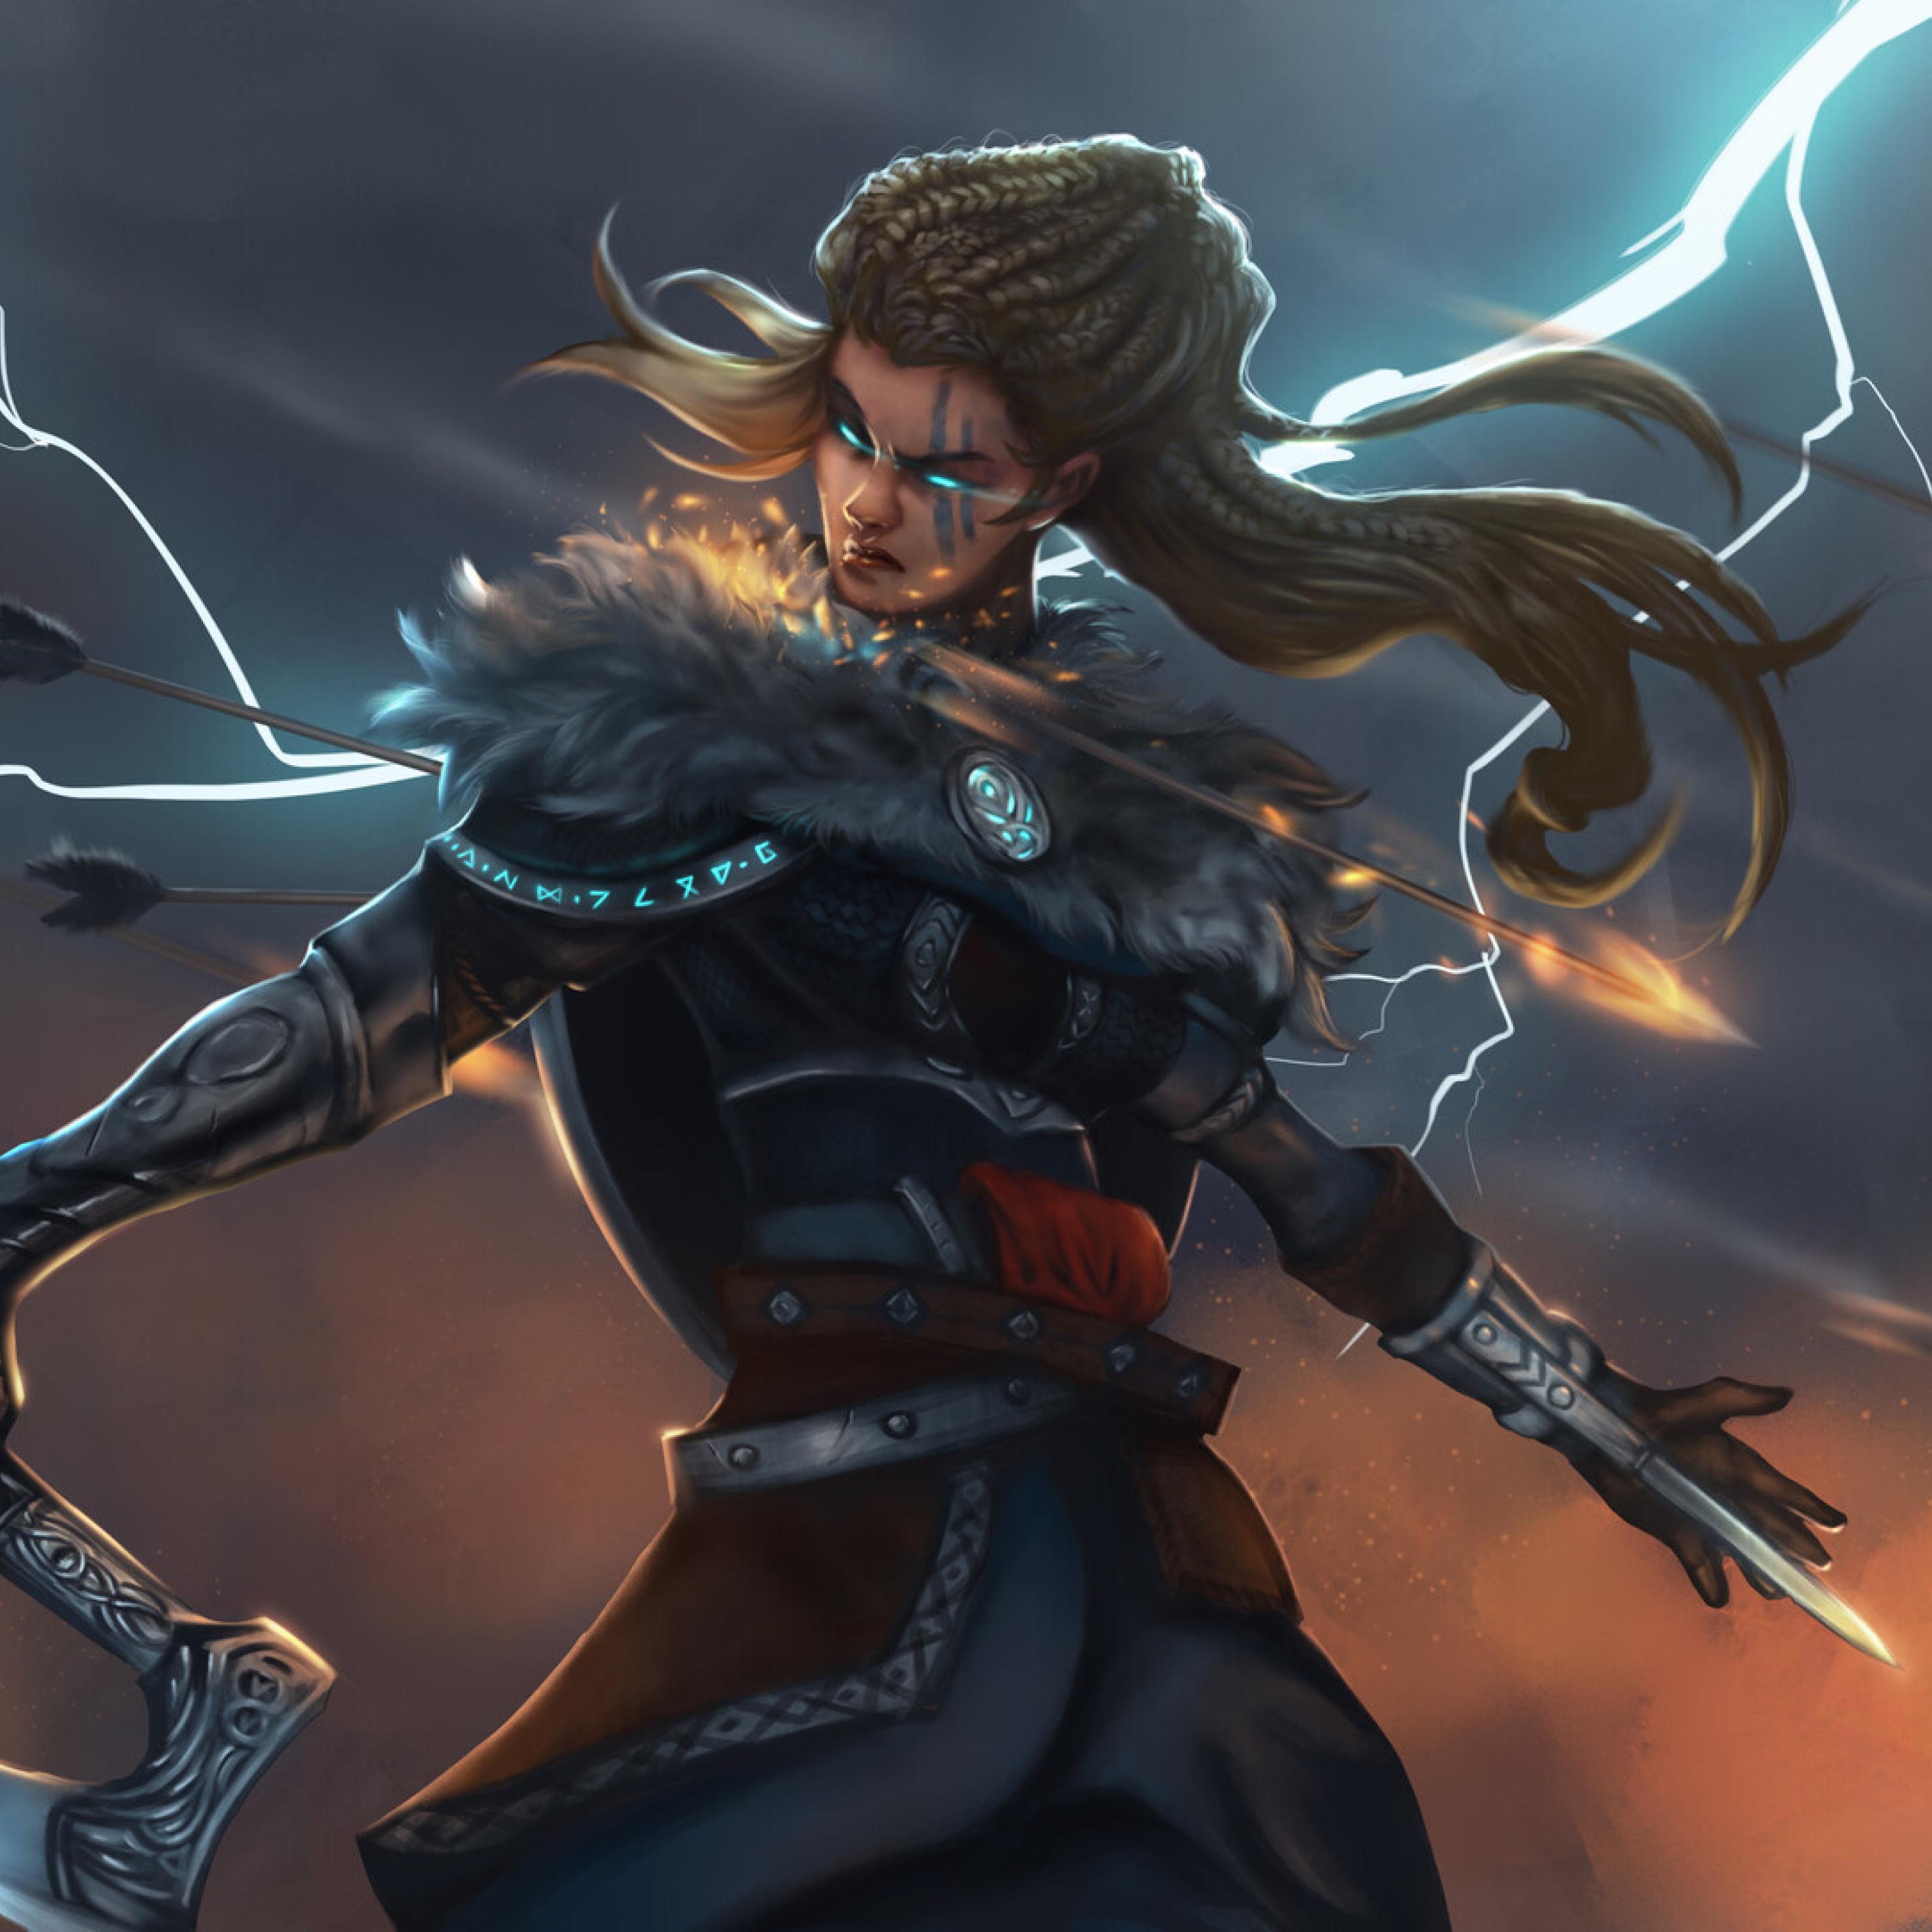 2932x2932 Assassin S Creed Valhalla Woman Warrior Ipad Pro Retina